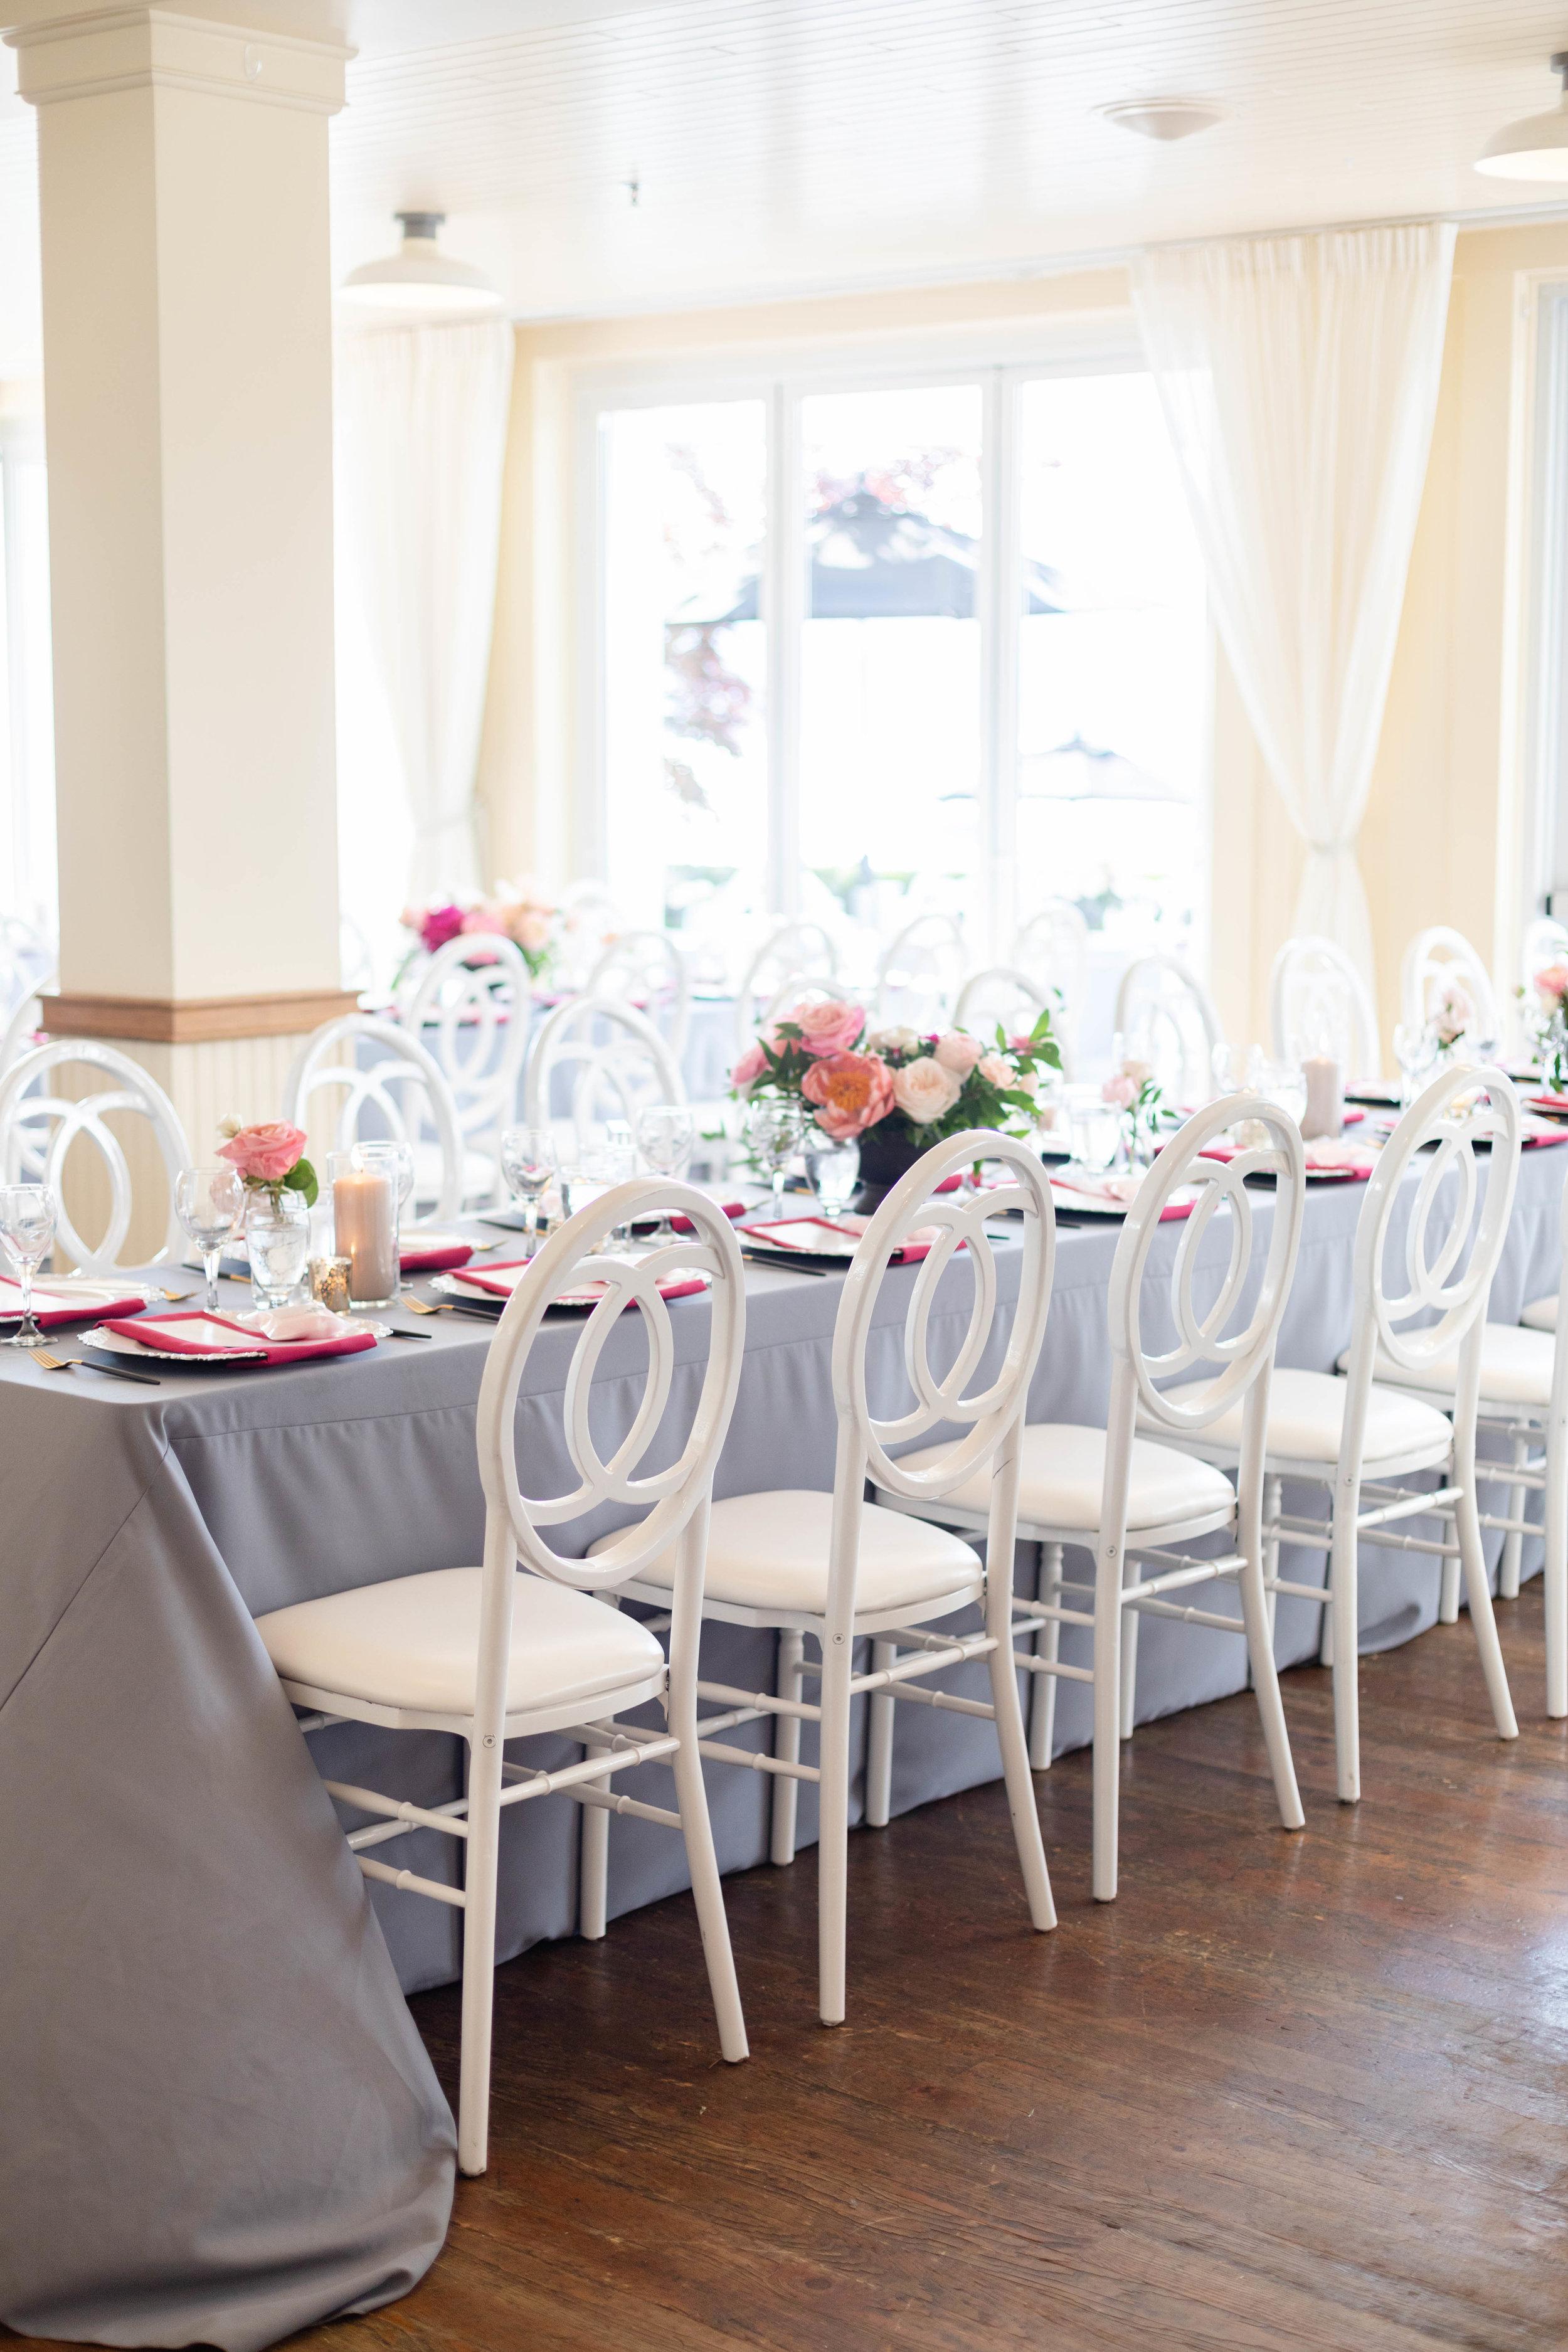 Hotel Eldorado Kelowna Wedding Reception.jpg